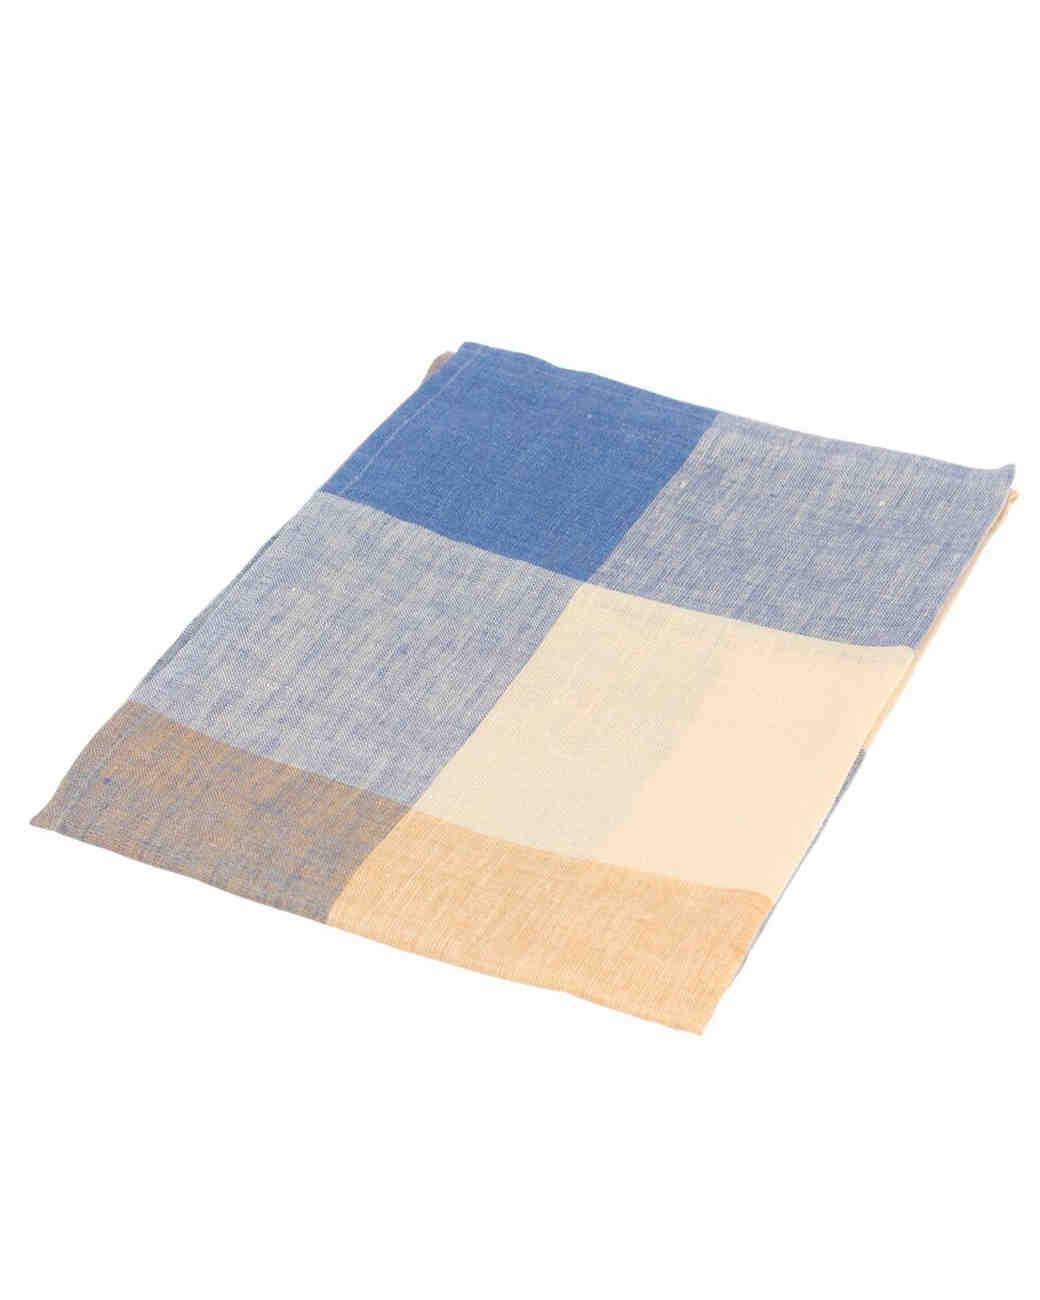 martha-bride-registry-athena-calderone-libeco-home-picnic-check-kitchen-towels-0515.jpg